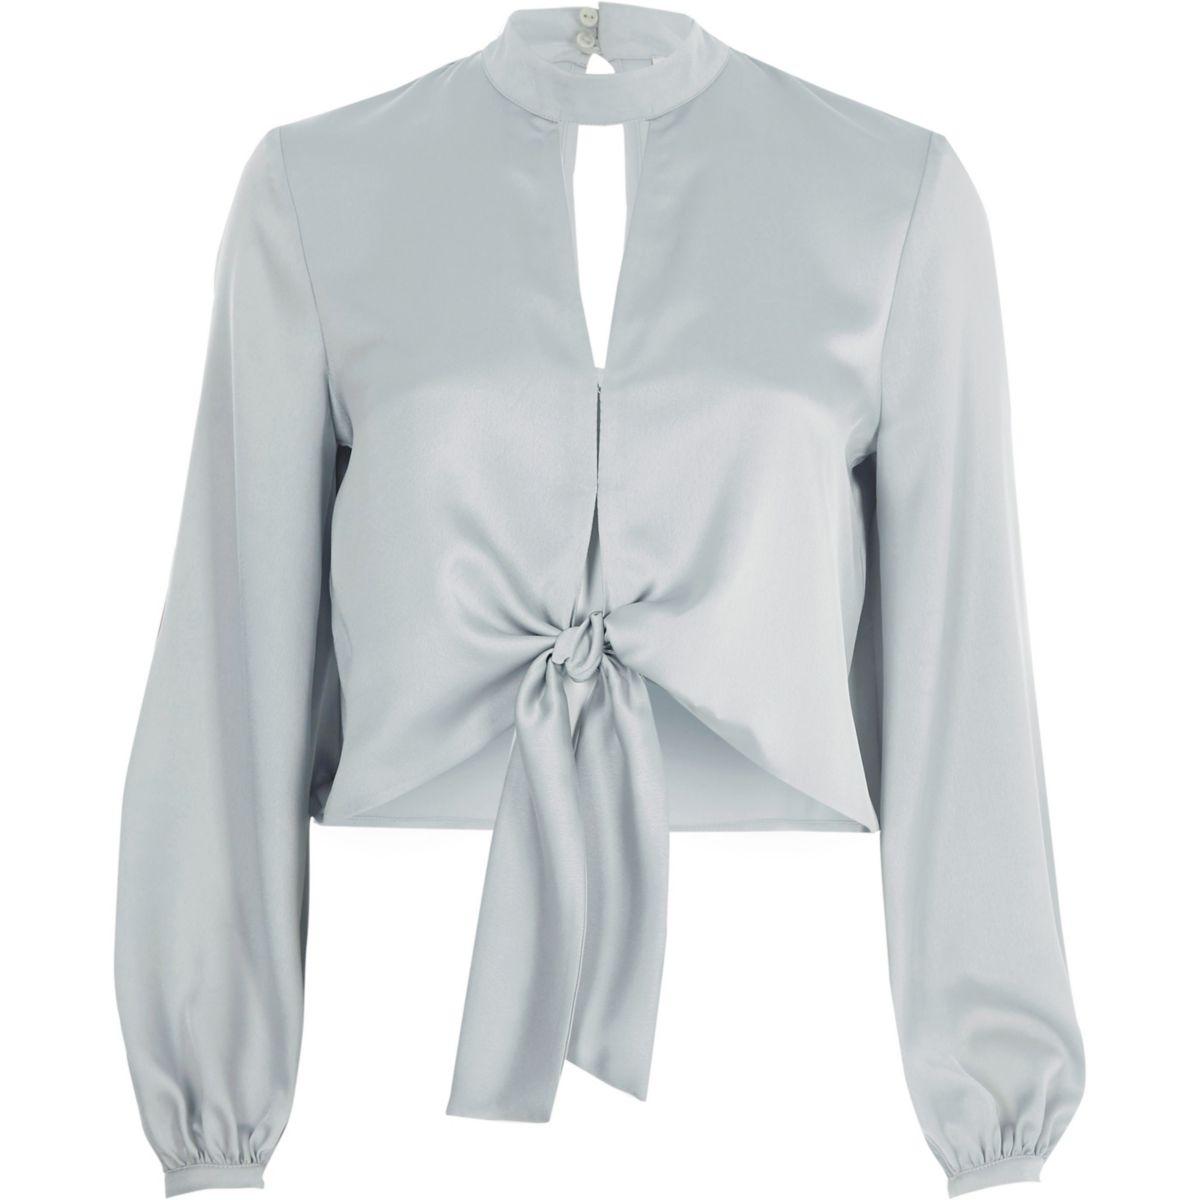 Light grey satin choker long sleeve crop top